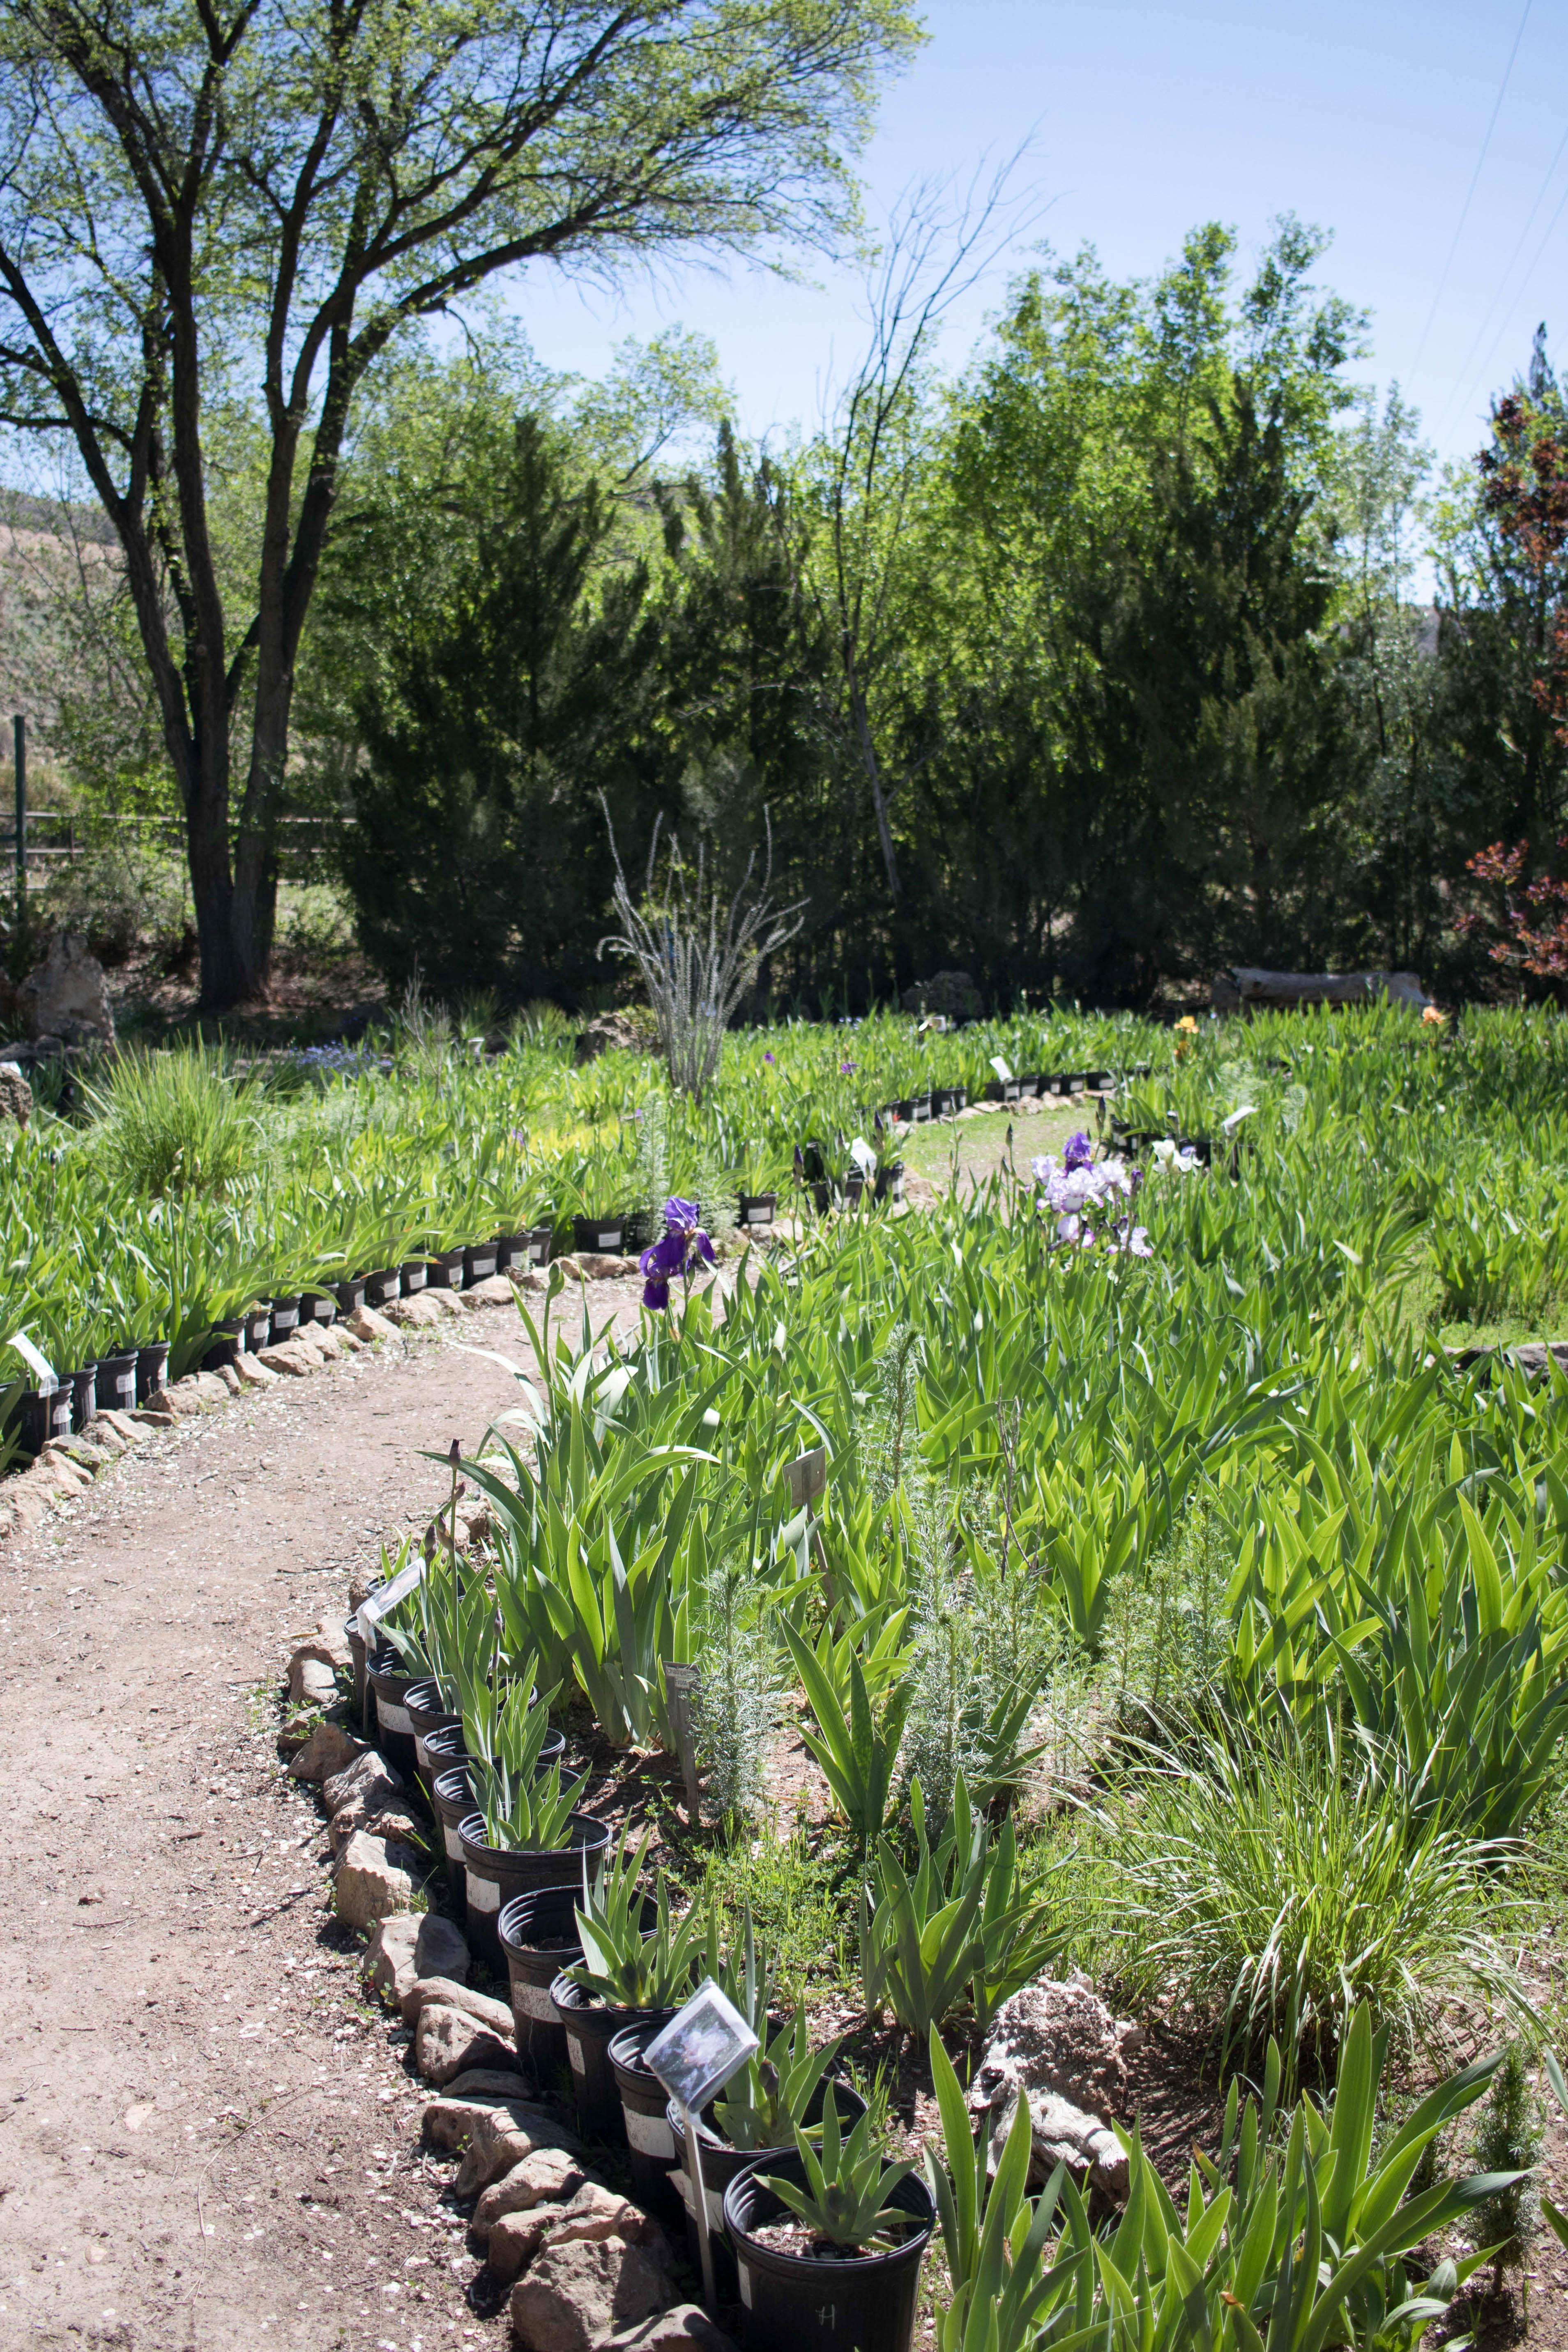 hondo iris farm Ruidoso New Mexico #irisfarm #flowers #iris